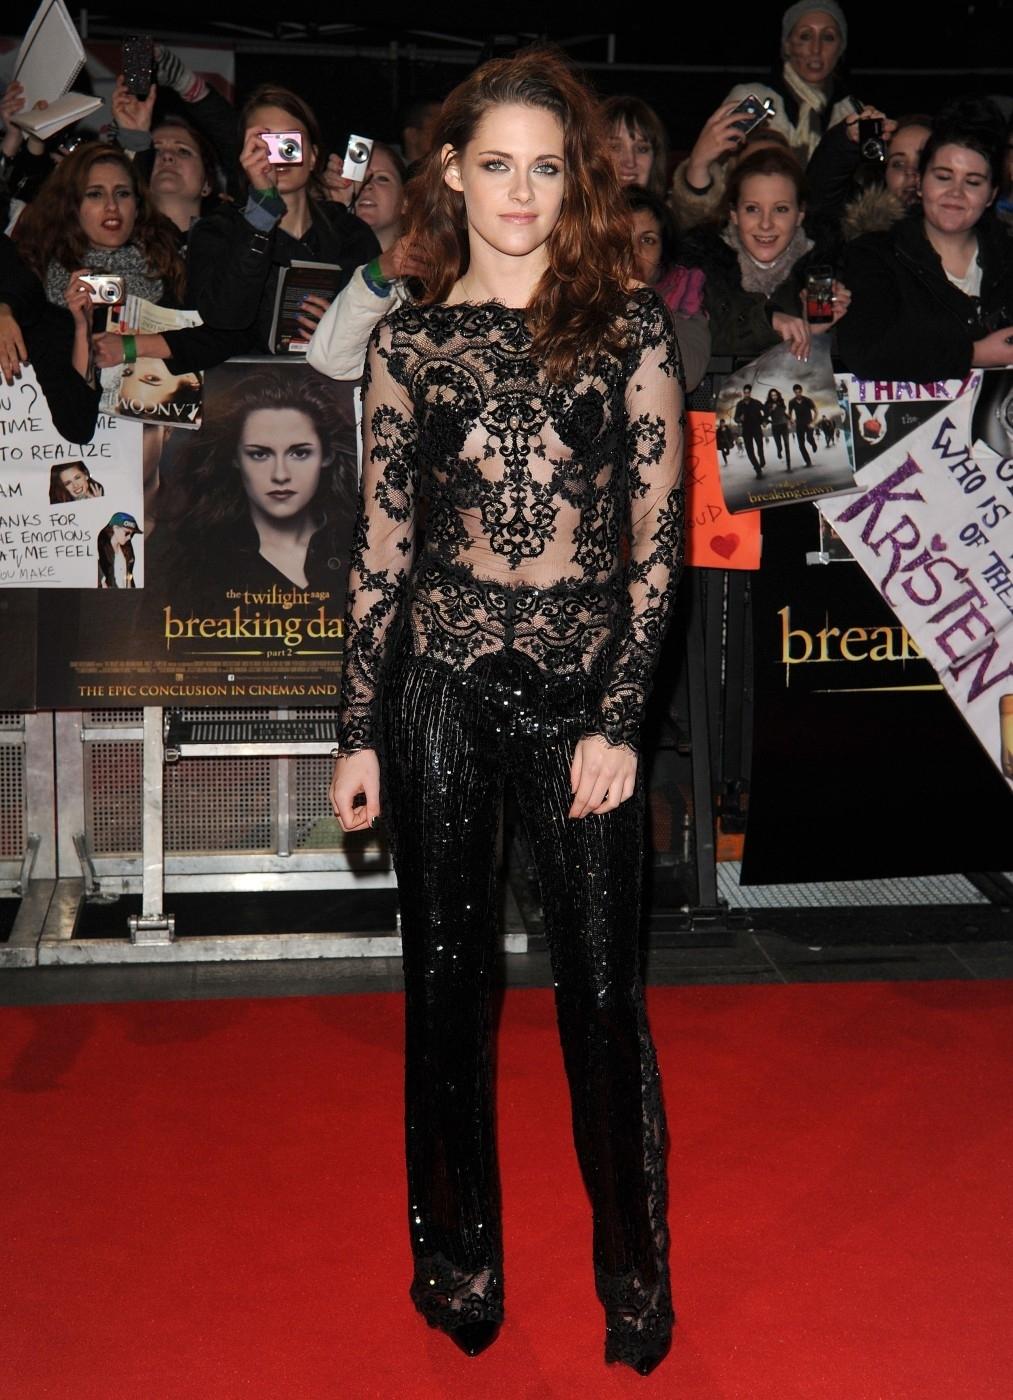 Kristen London